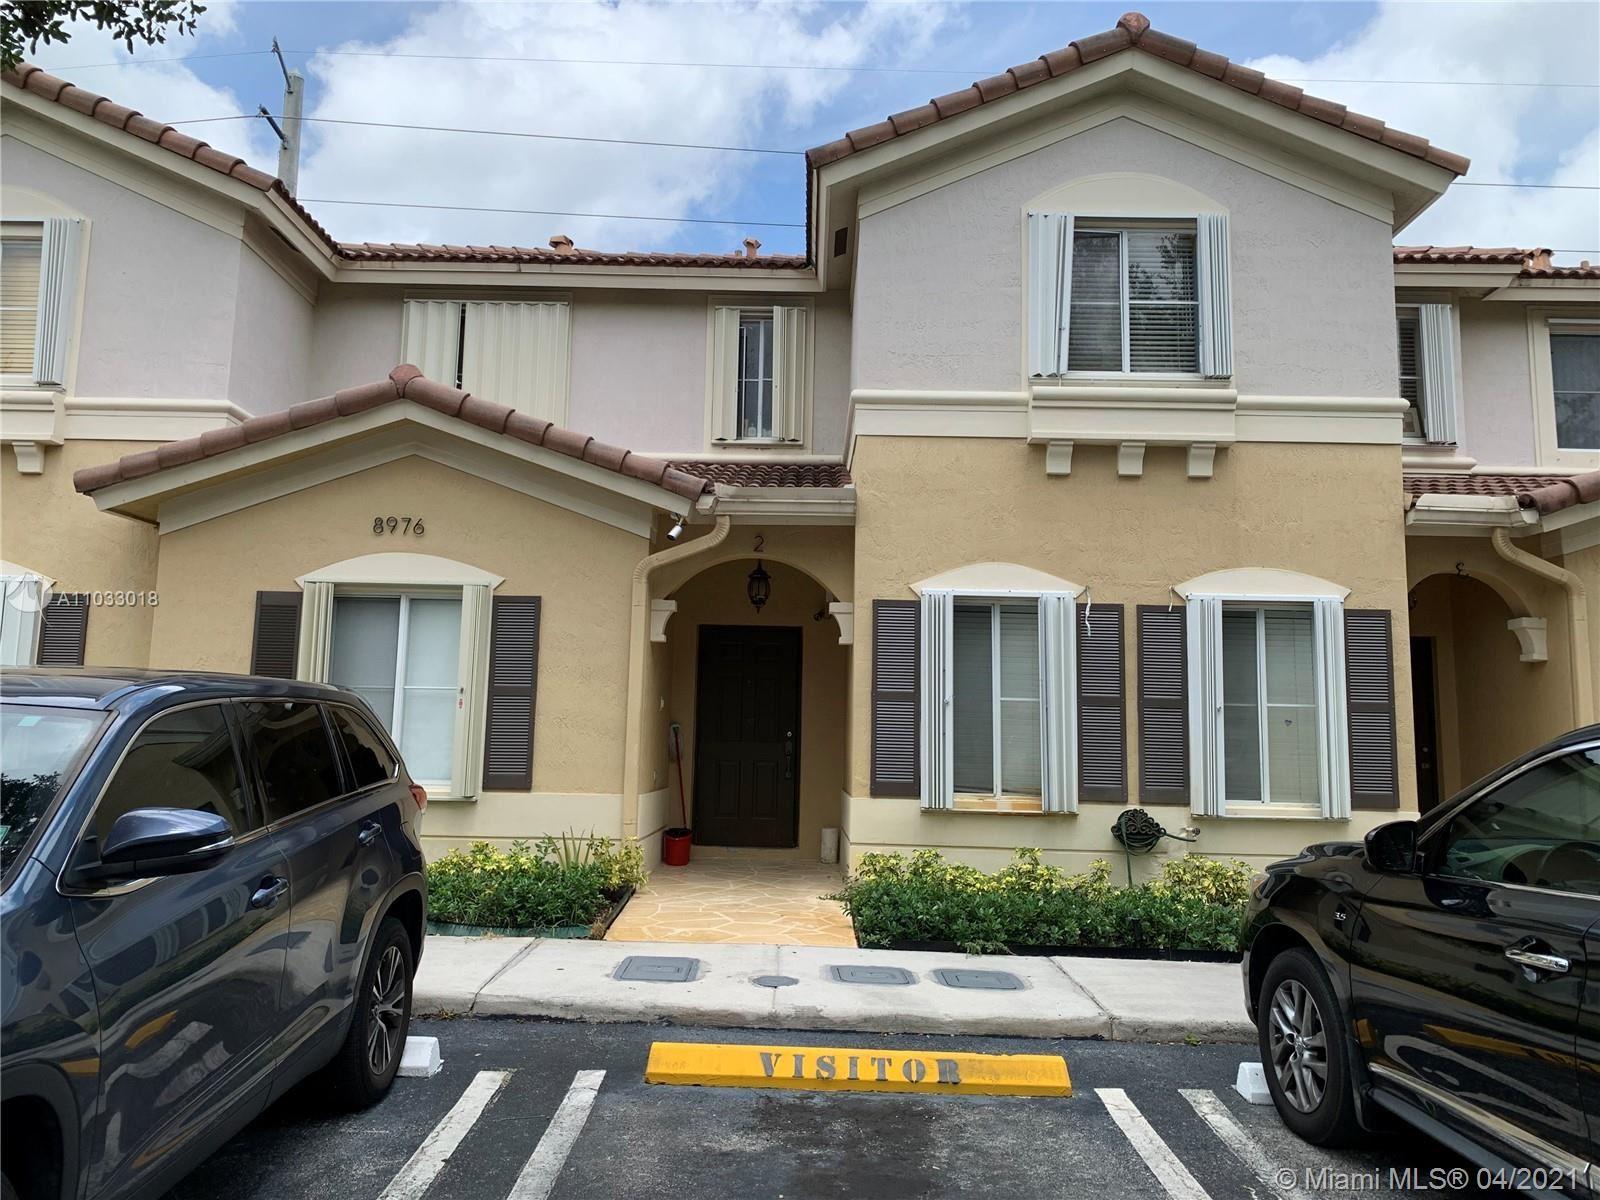 8976 W Flagler St #2, Miami, FL 33174 - #: A11033018